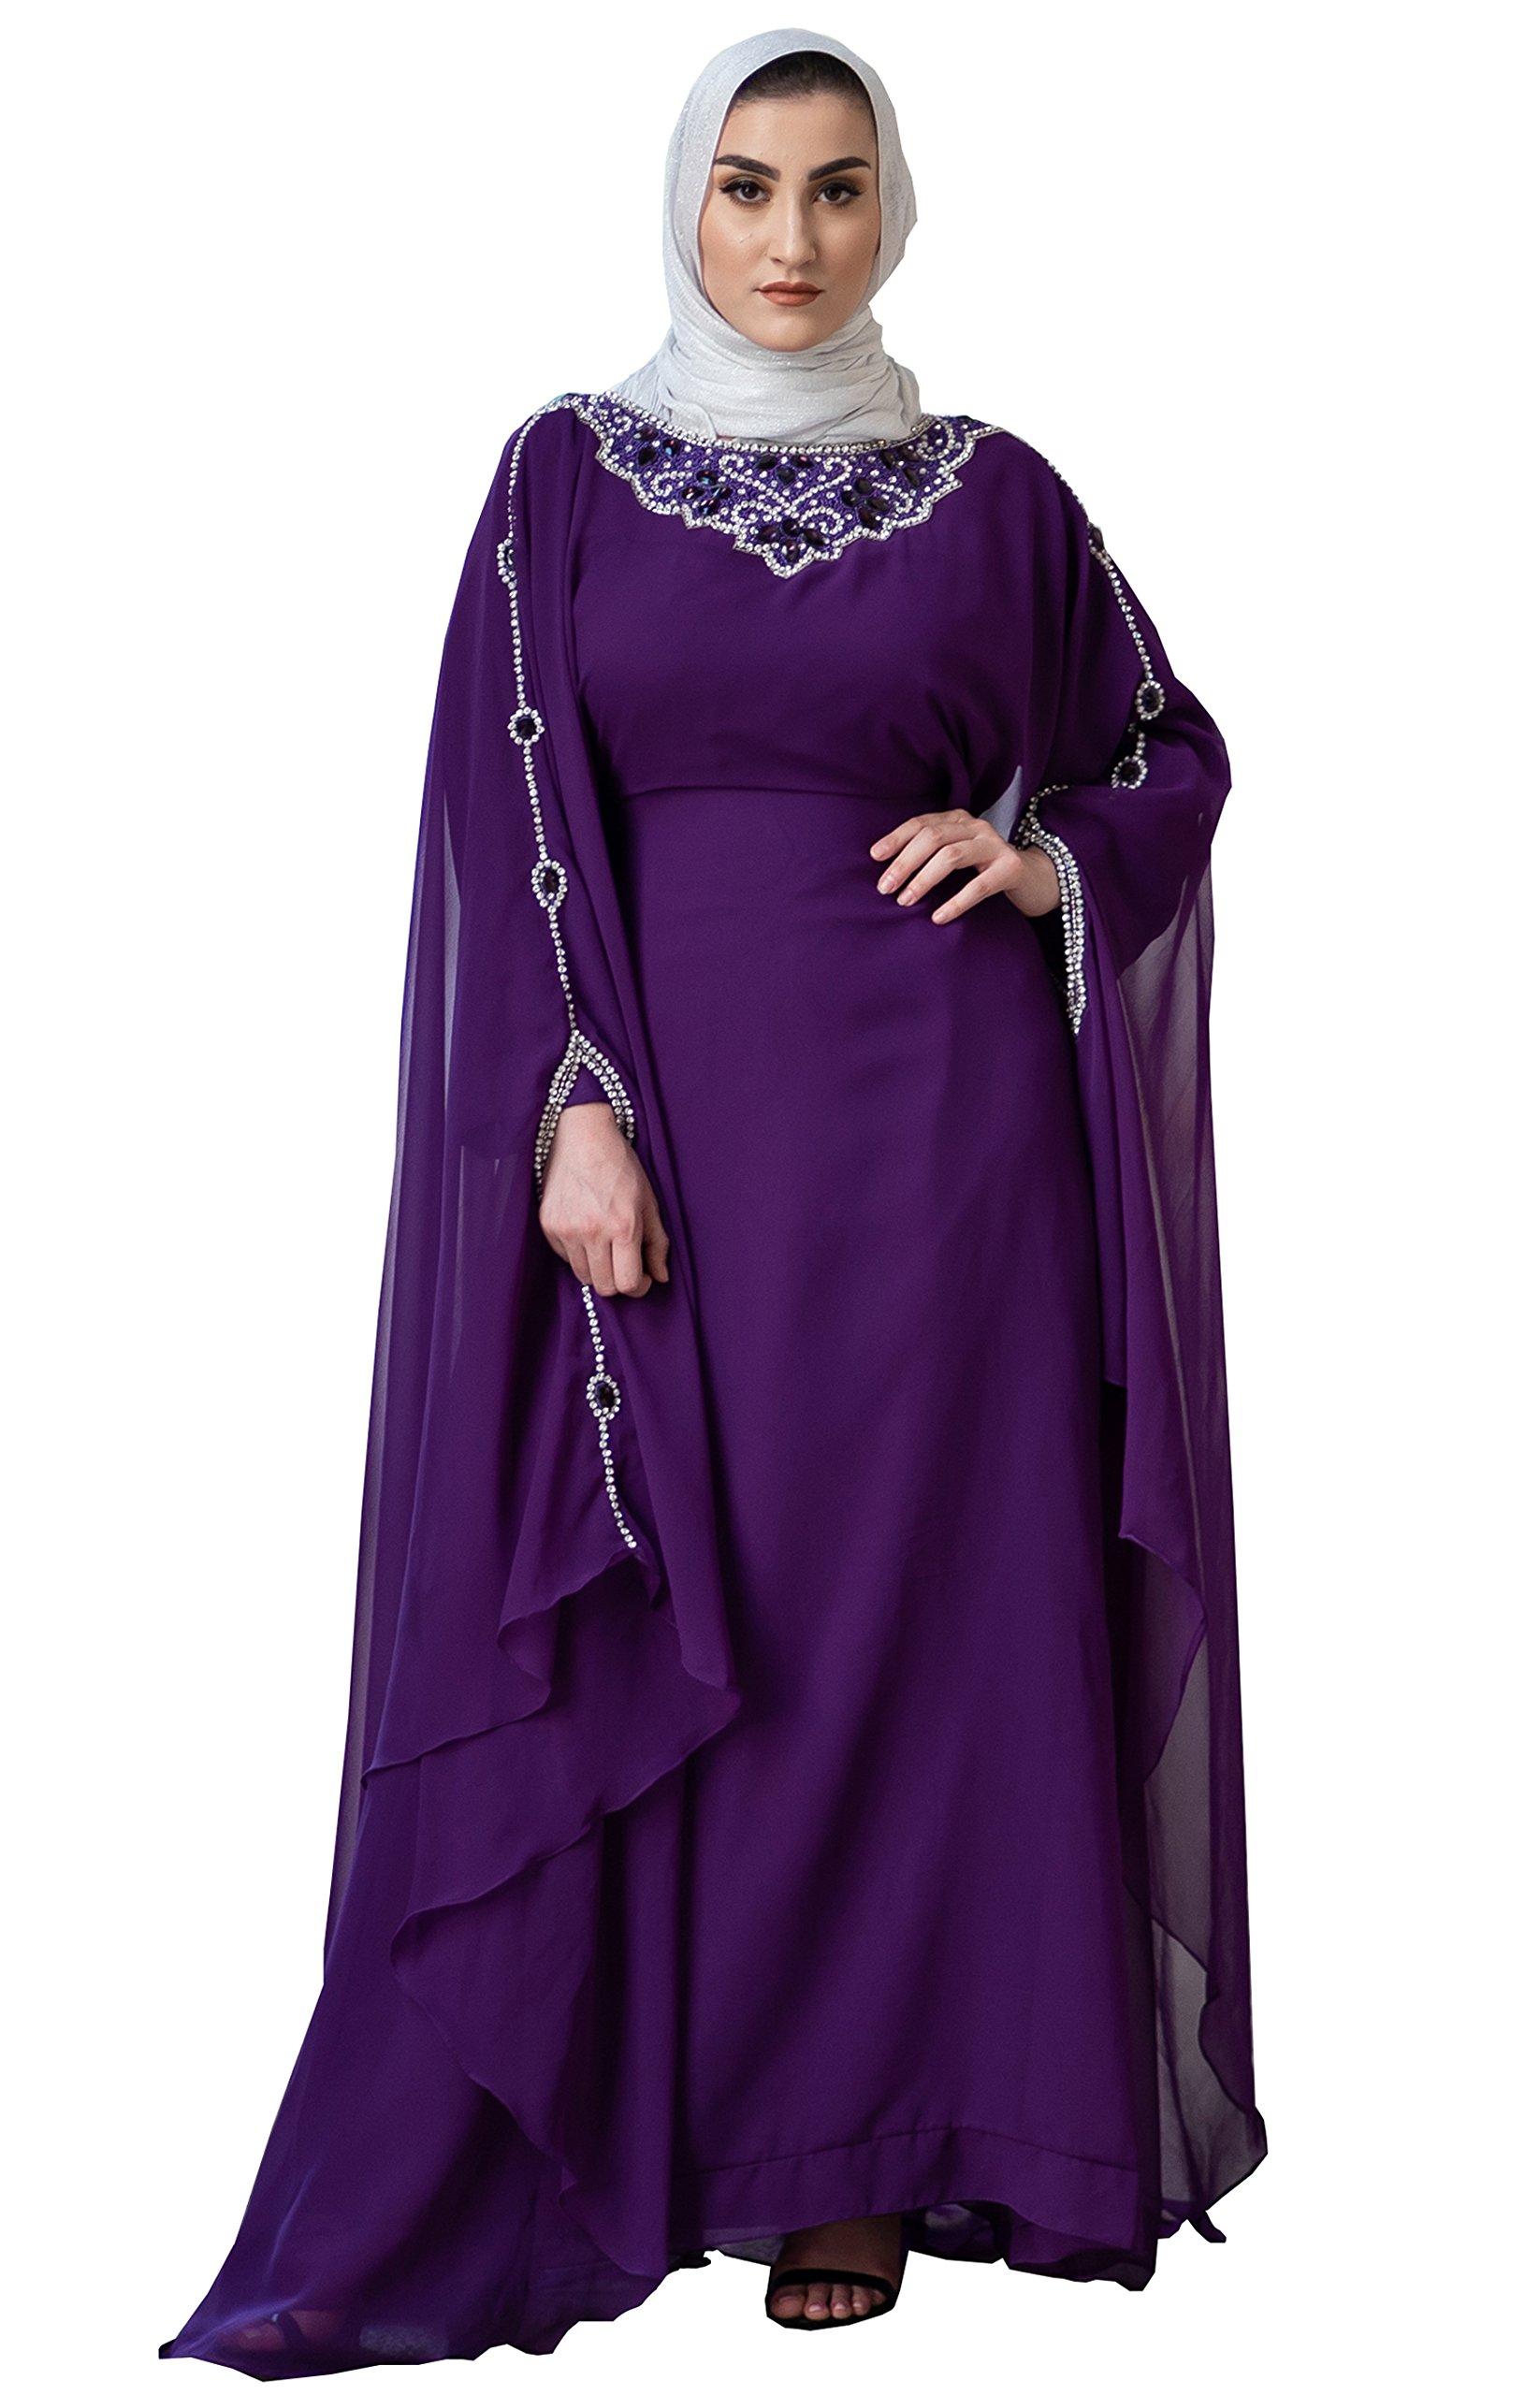 Alexis Kaftan Long Sleeves (Purple) - Beautiful Party Wear Kaftan Ladies 100% Chiffon Maxi Dress